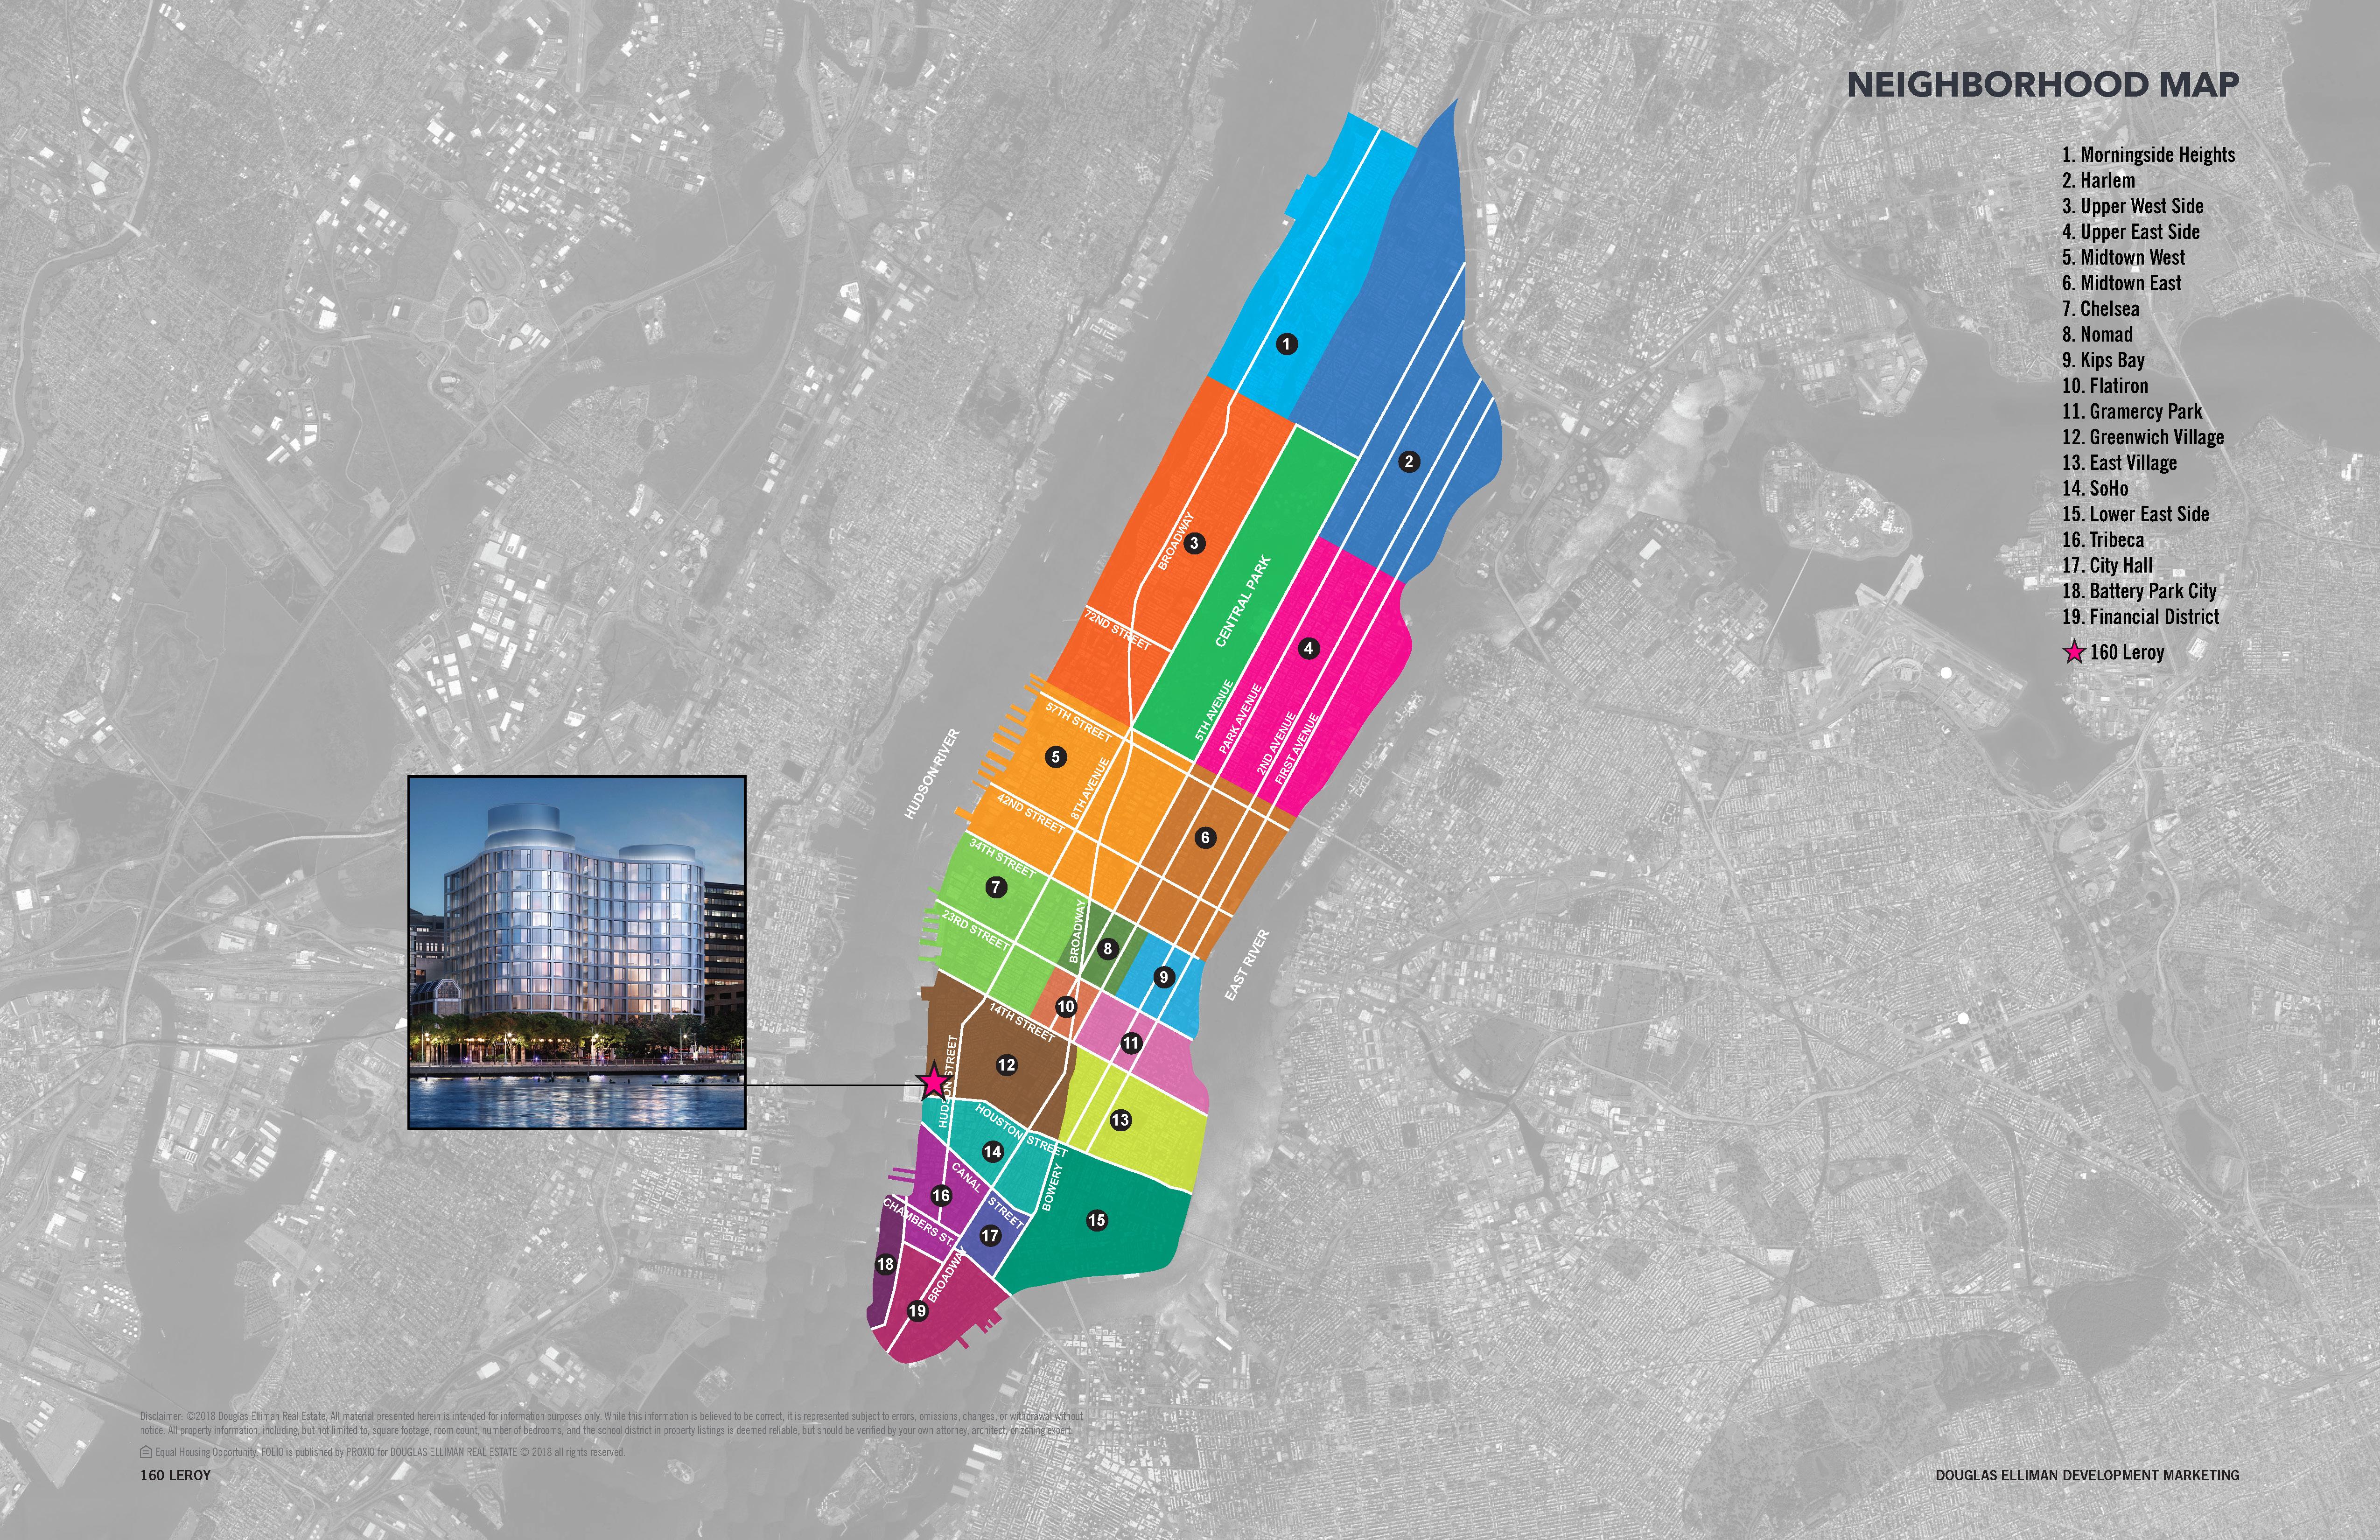 160 Leroy - Condominium (Freehold)  New York, NY, United